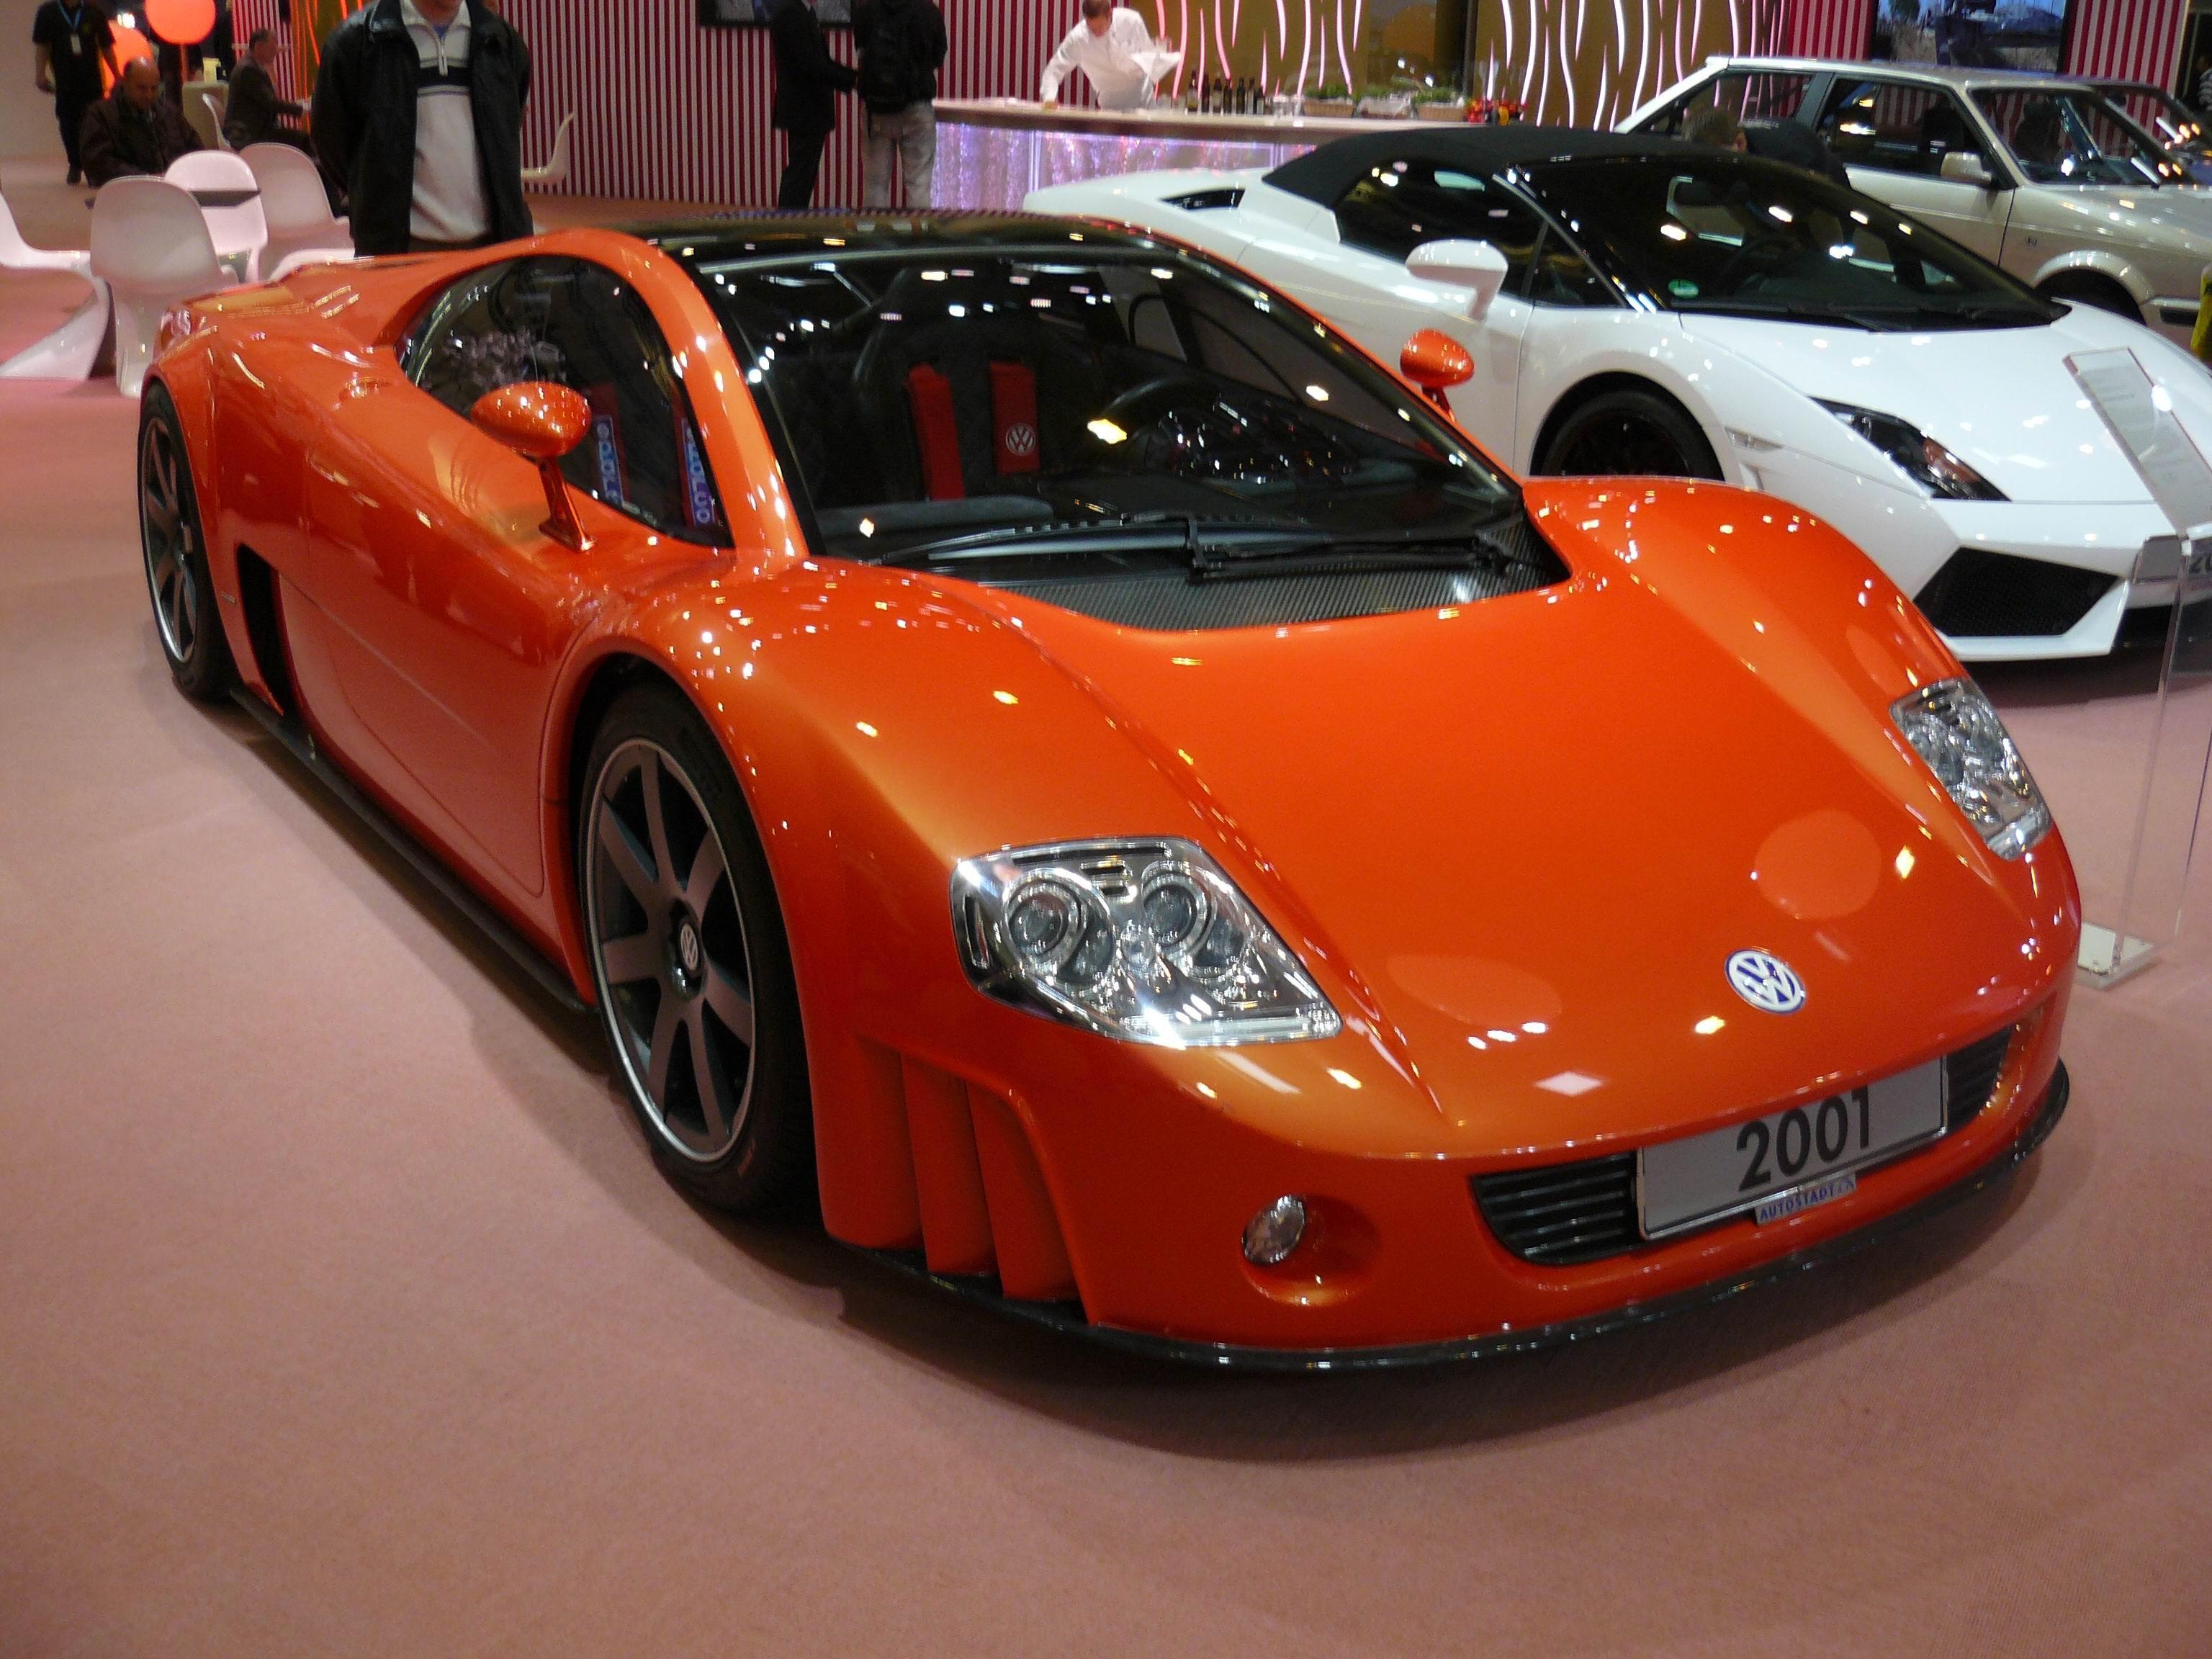 File:Volkswagen W12 Nardo 2001.jpg - Wikimedia Commons